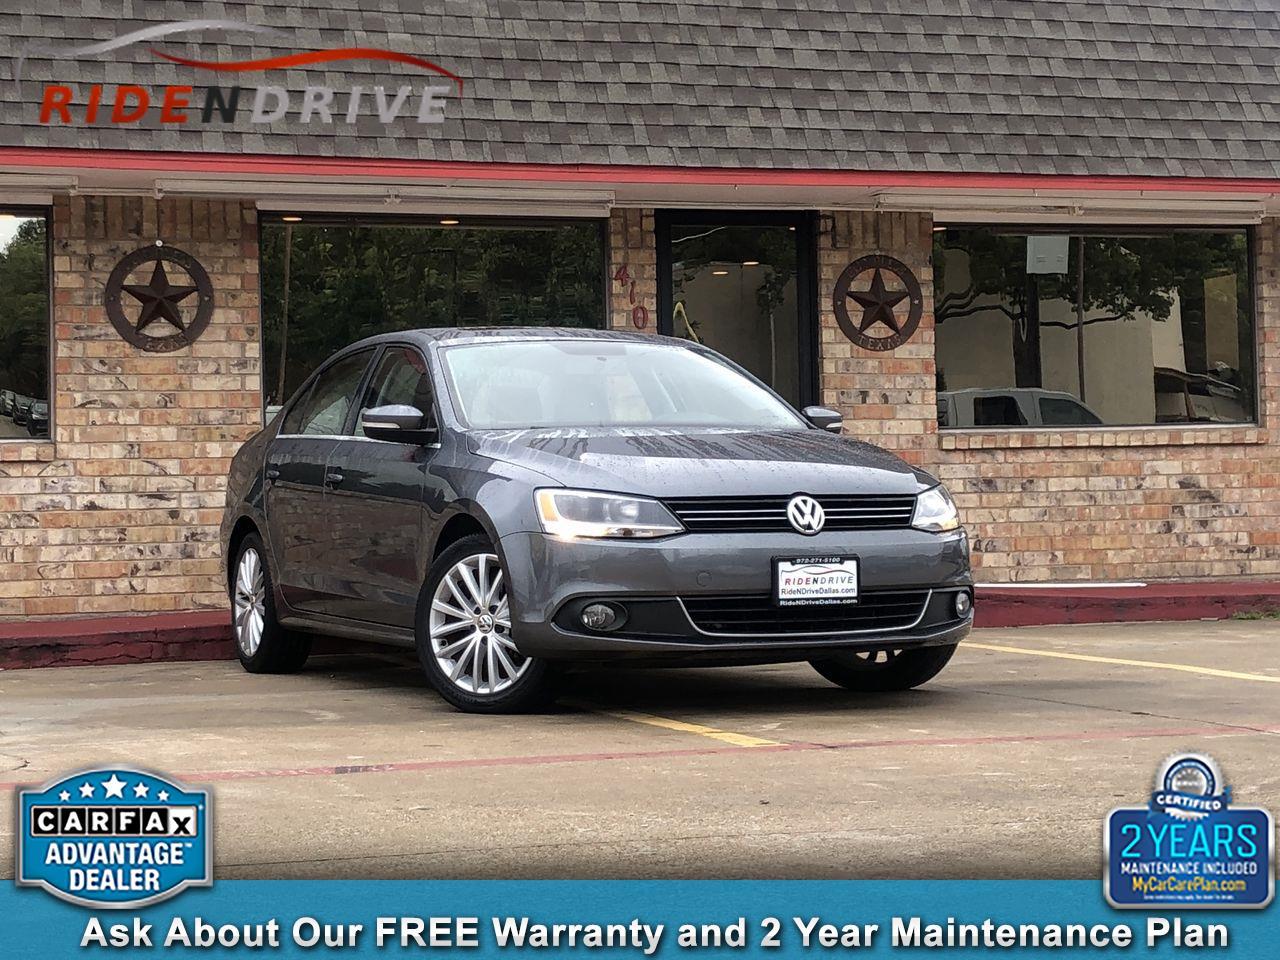 2014 Volkswagen Jetta Sedan 4dr DSG TDI w/Premium/Nav